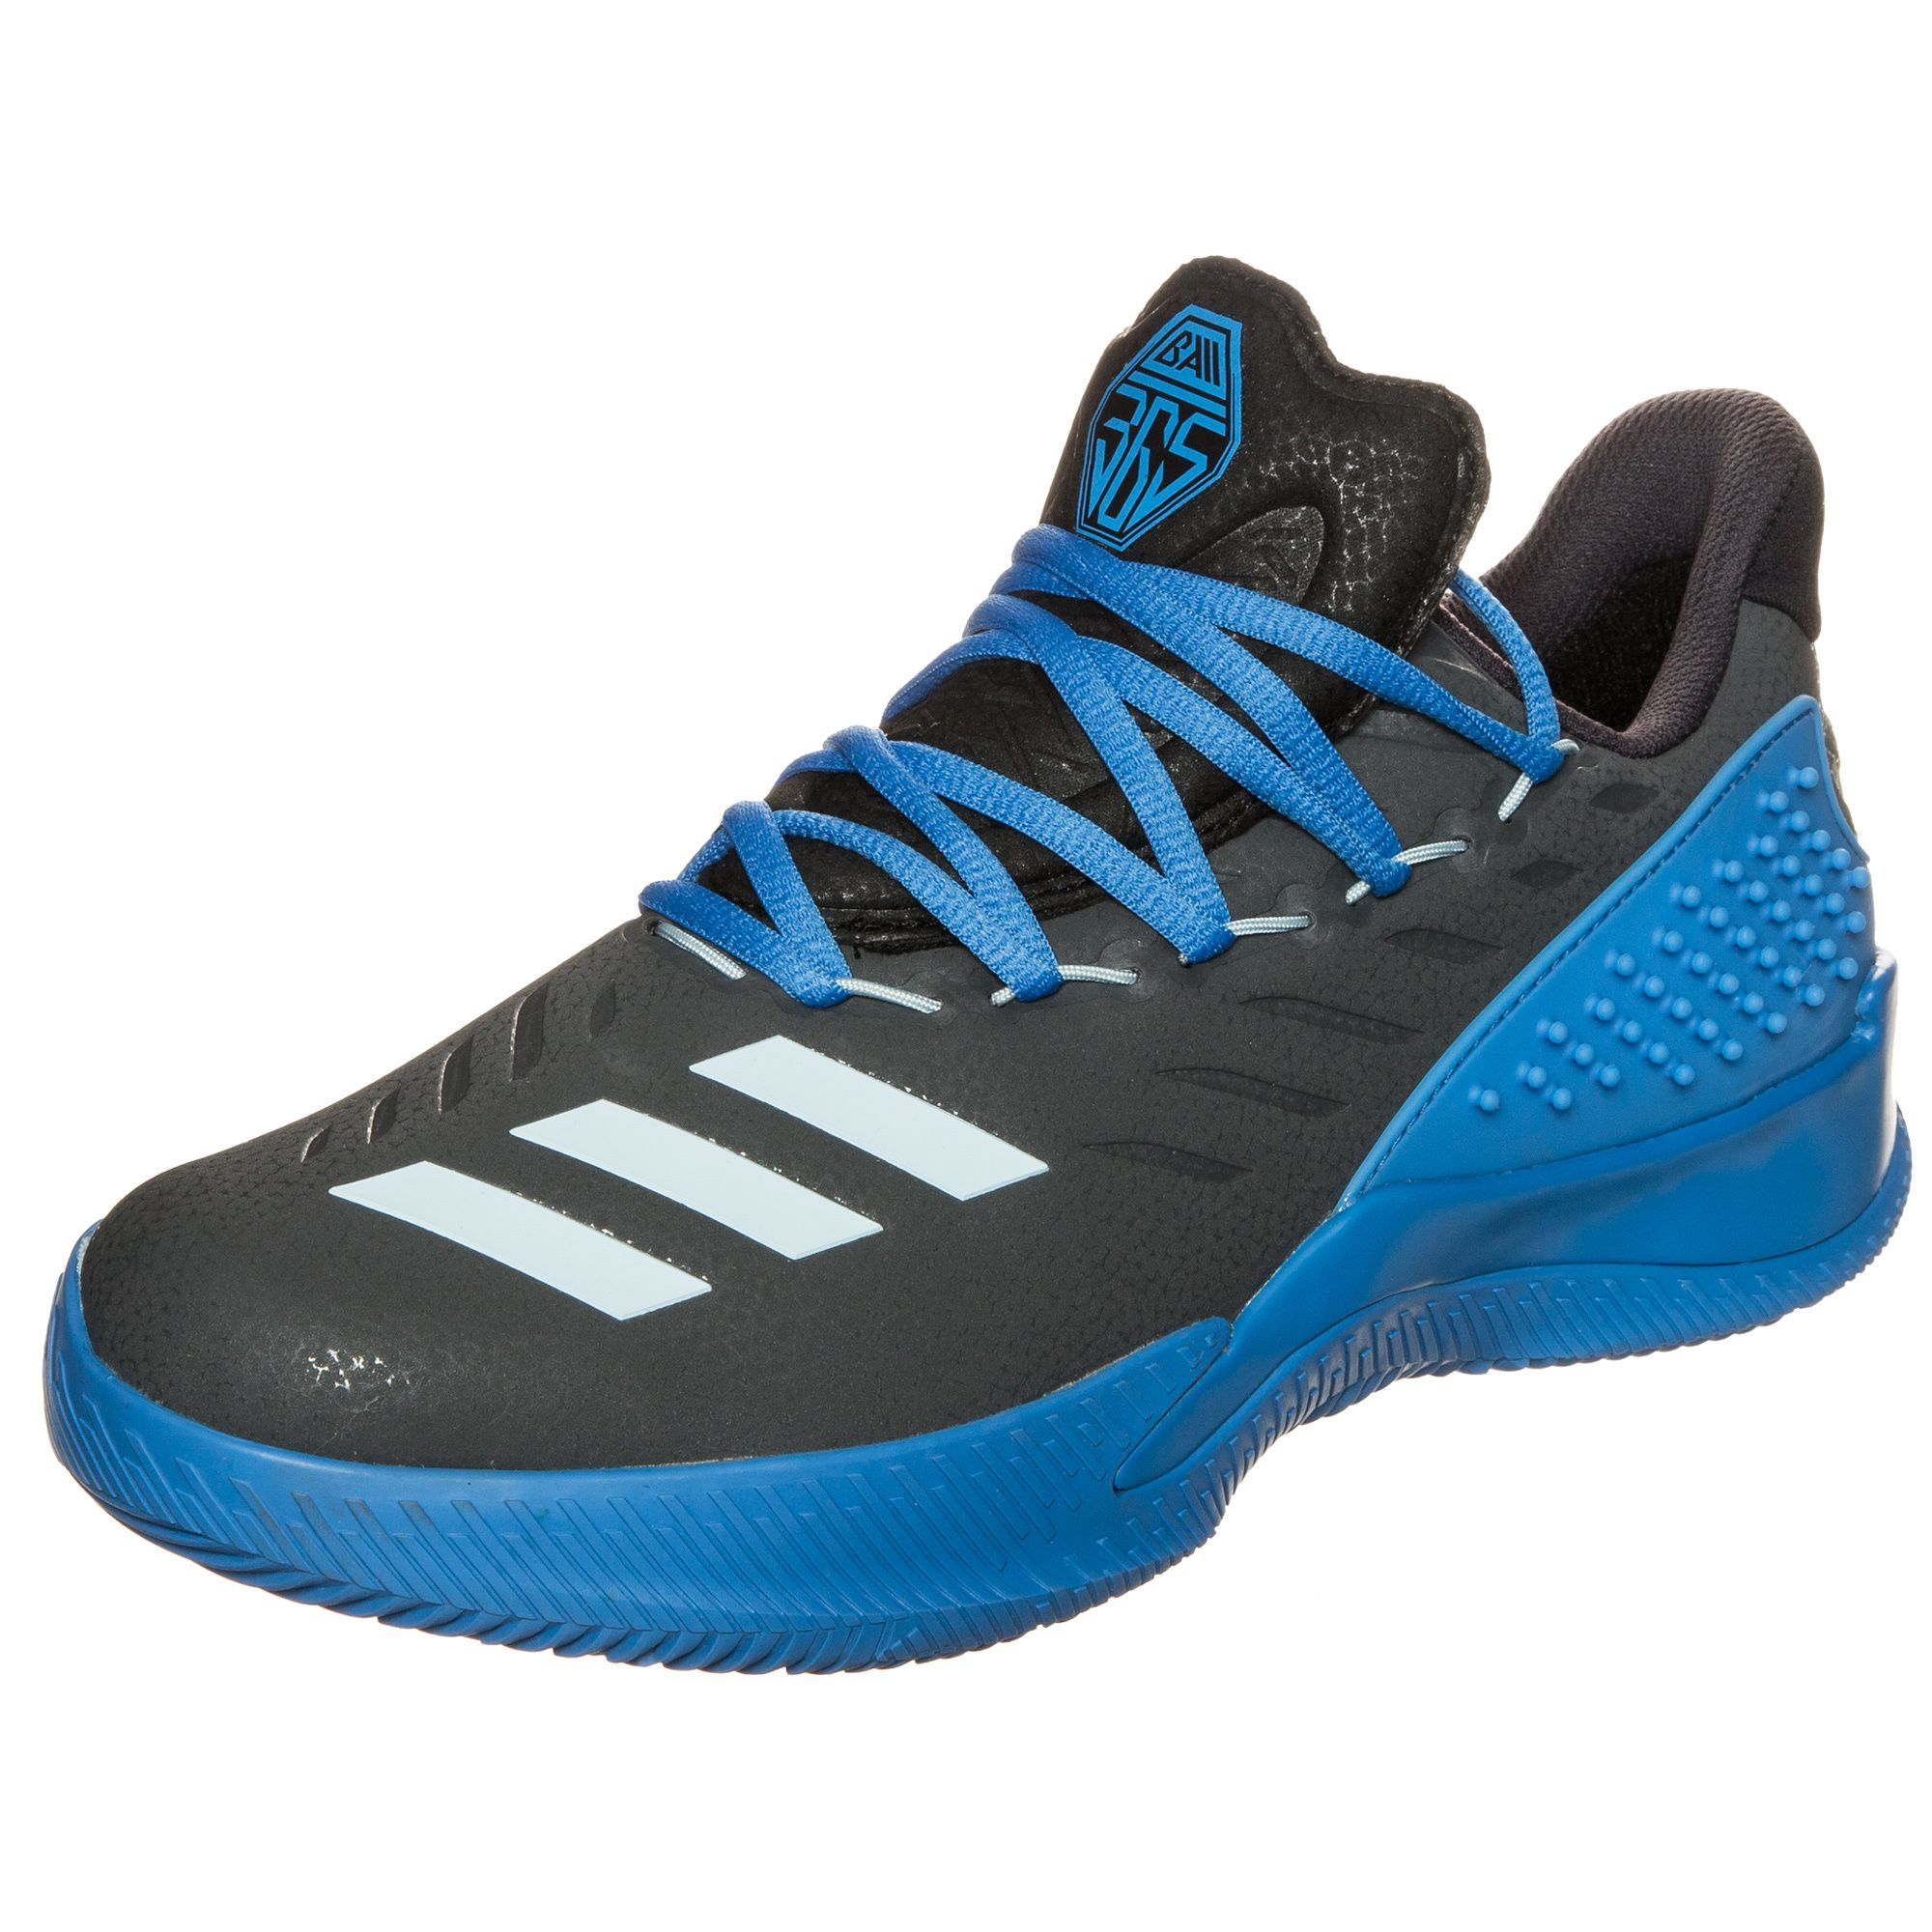 ADIDAS PERFORMANCE adidas Performance Ball 365 Basketballschuh Herren